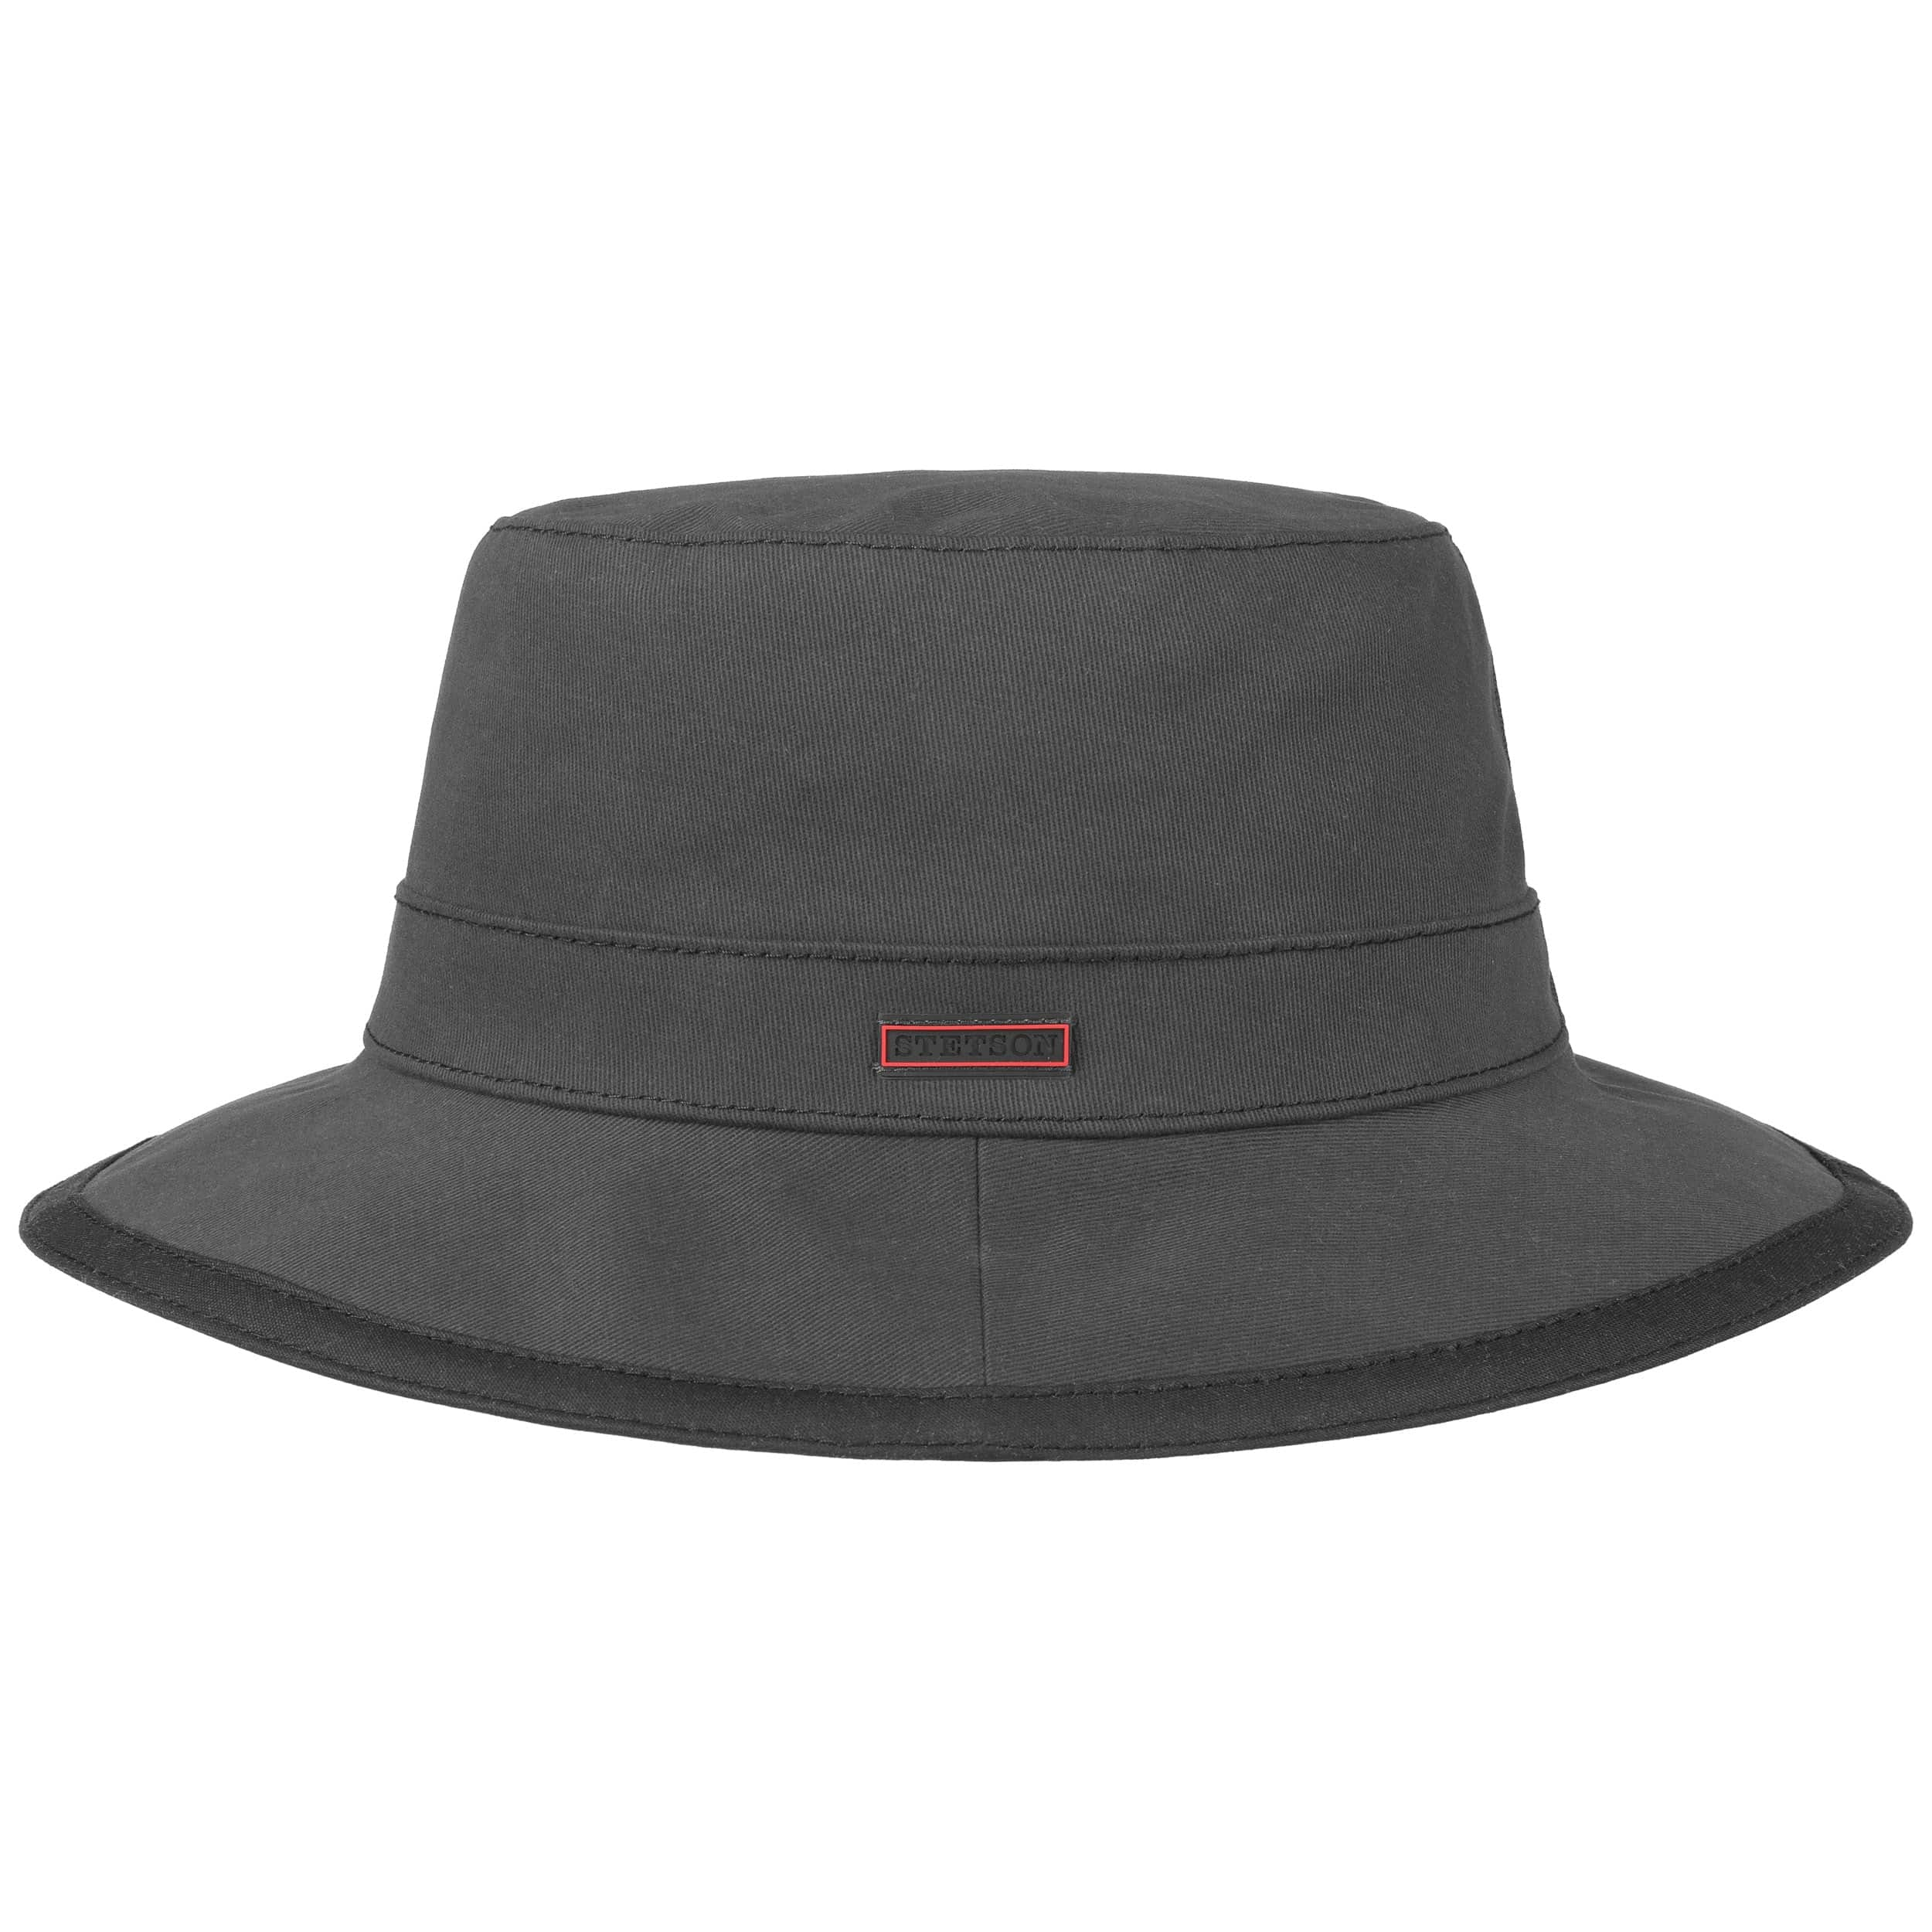 ... Tenakill Atkins Cloth Hat by Stetson - grey 4 ... 9550d492821